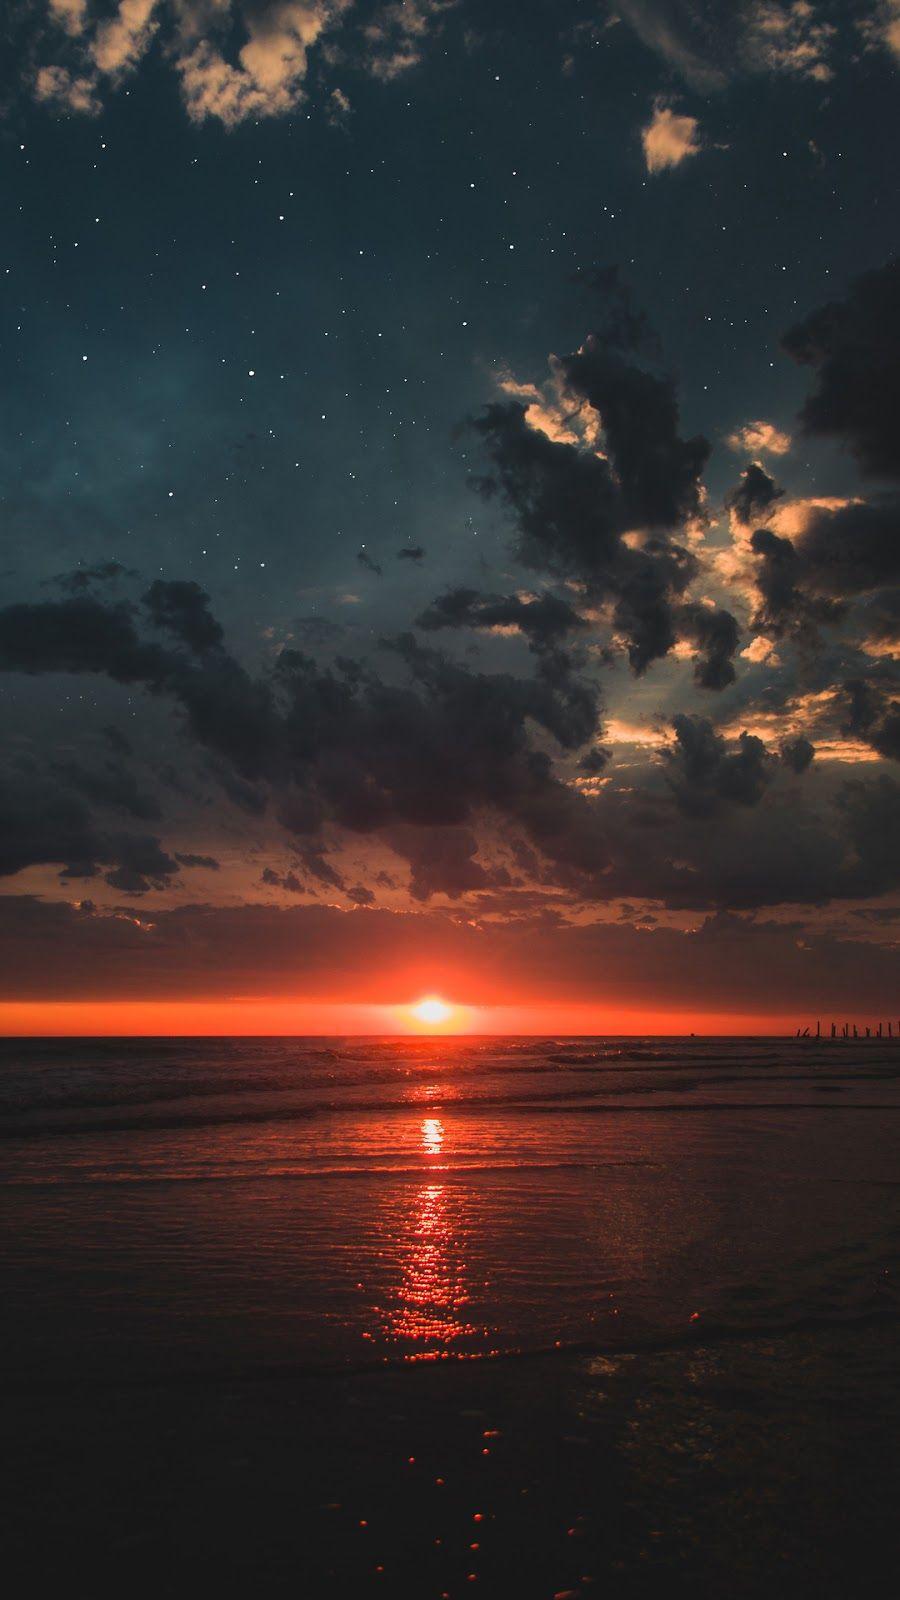 Beach Sunset Wallpaper Beach Sunset Wallpaper Sunset